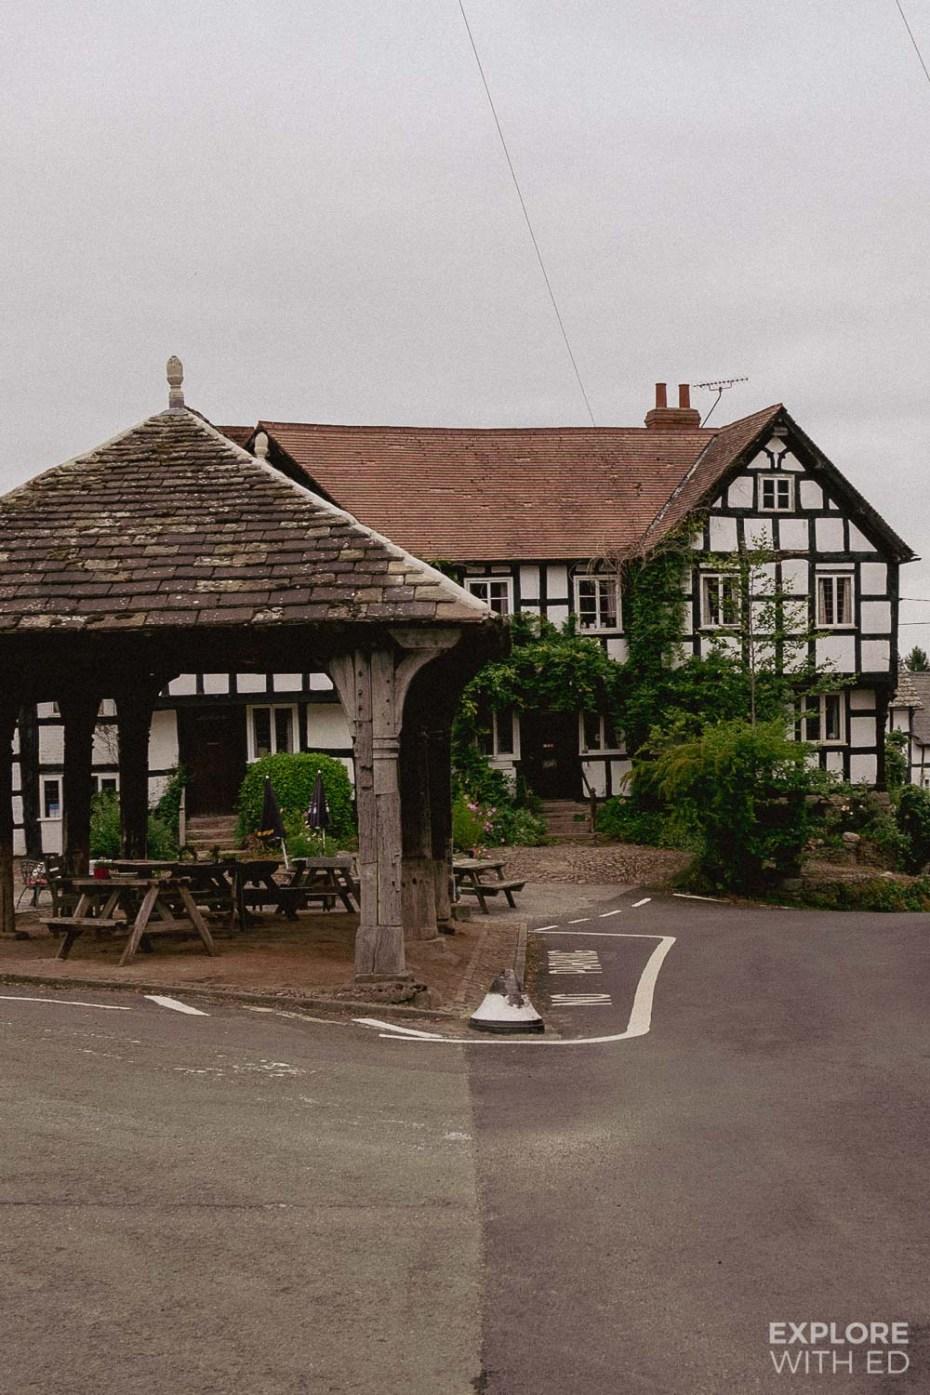 The New Inn Haunted Pub in Pembridge